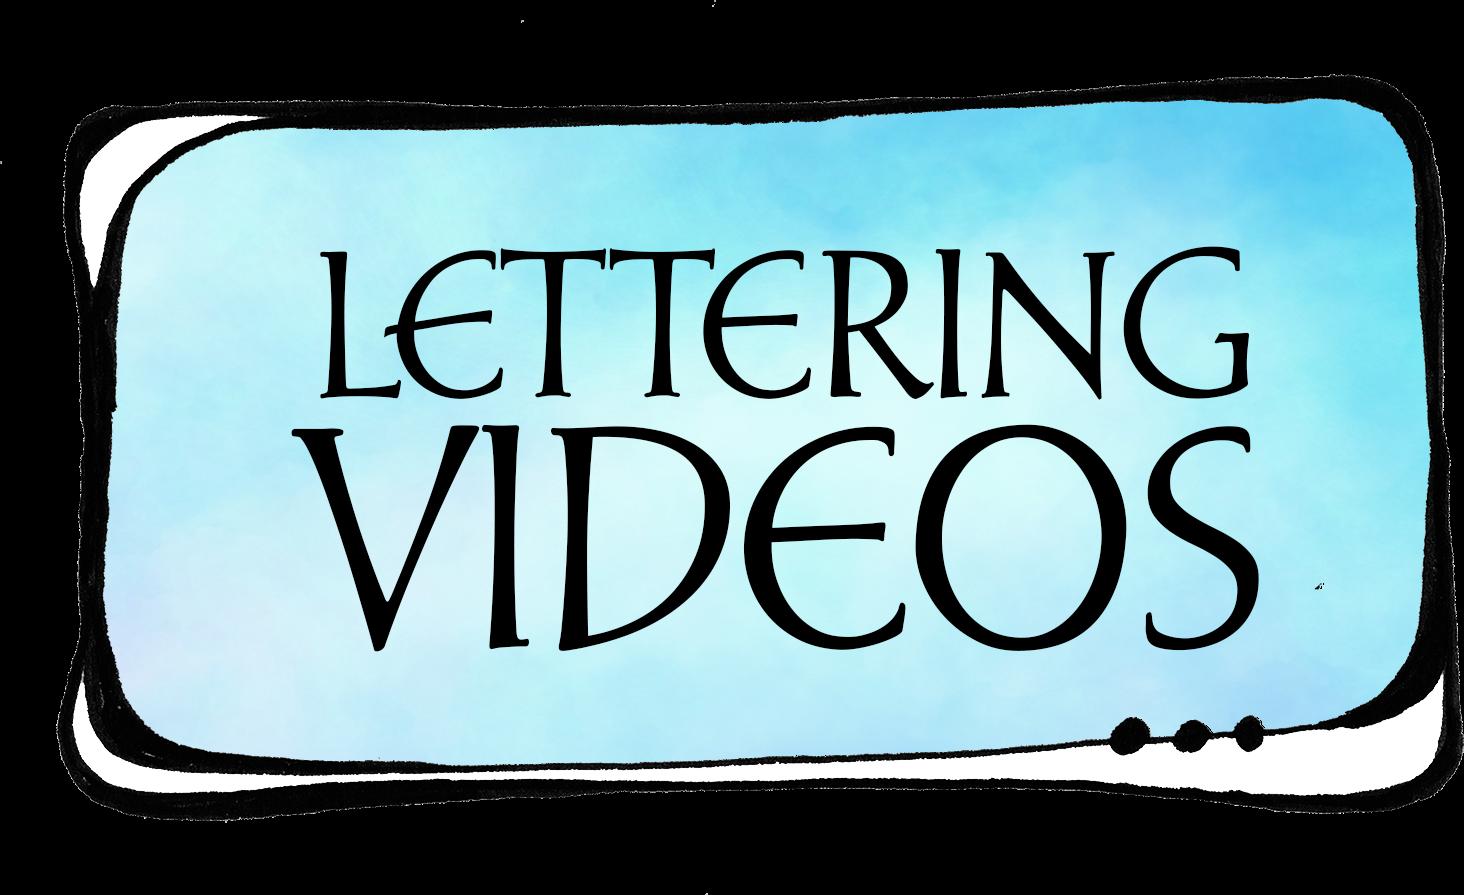 Lettering Videos